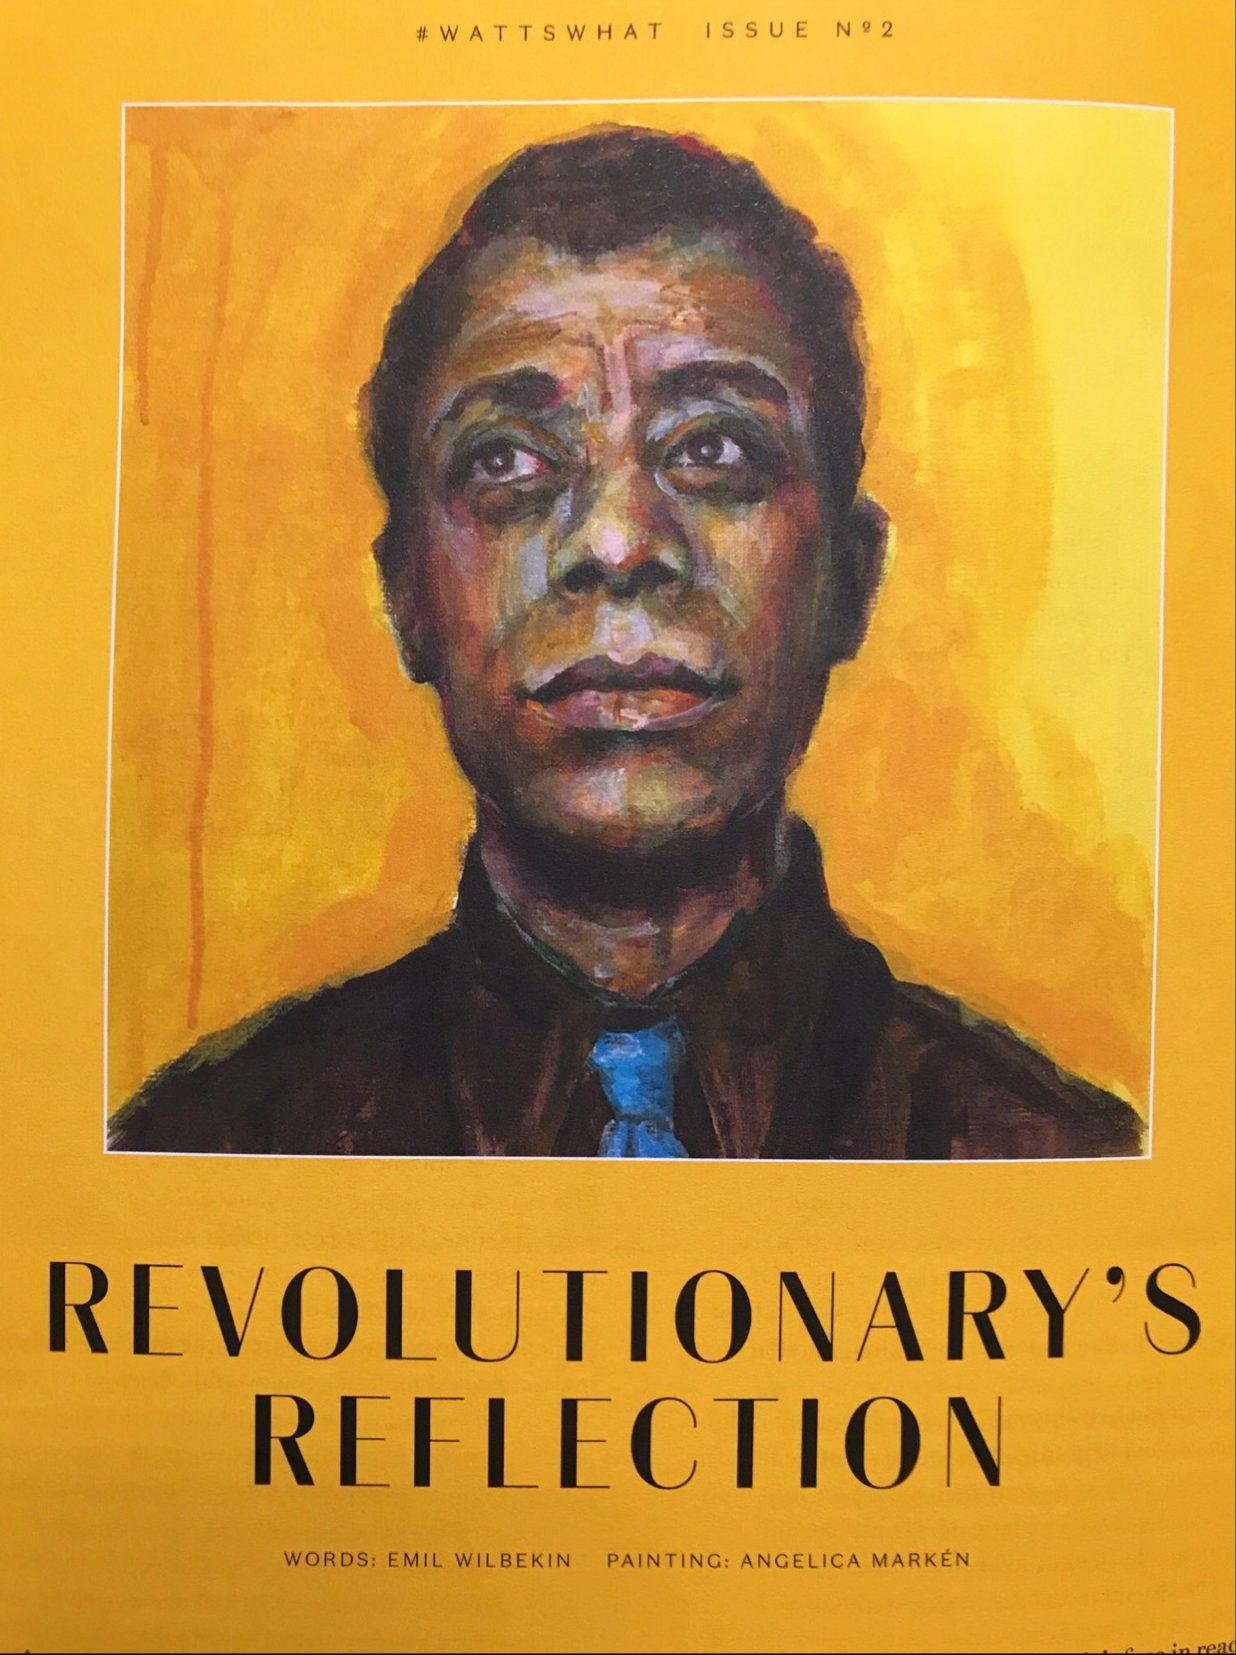 James Baldwin artist Angelica Markén 2018